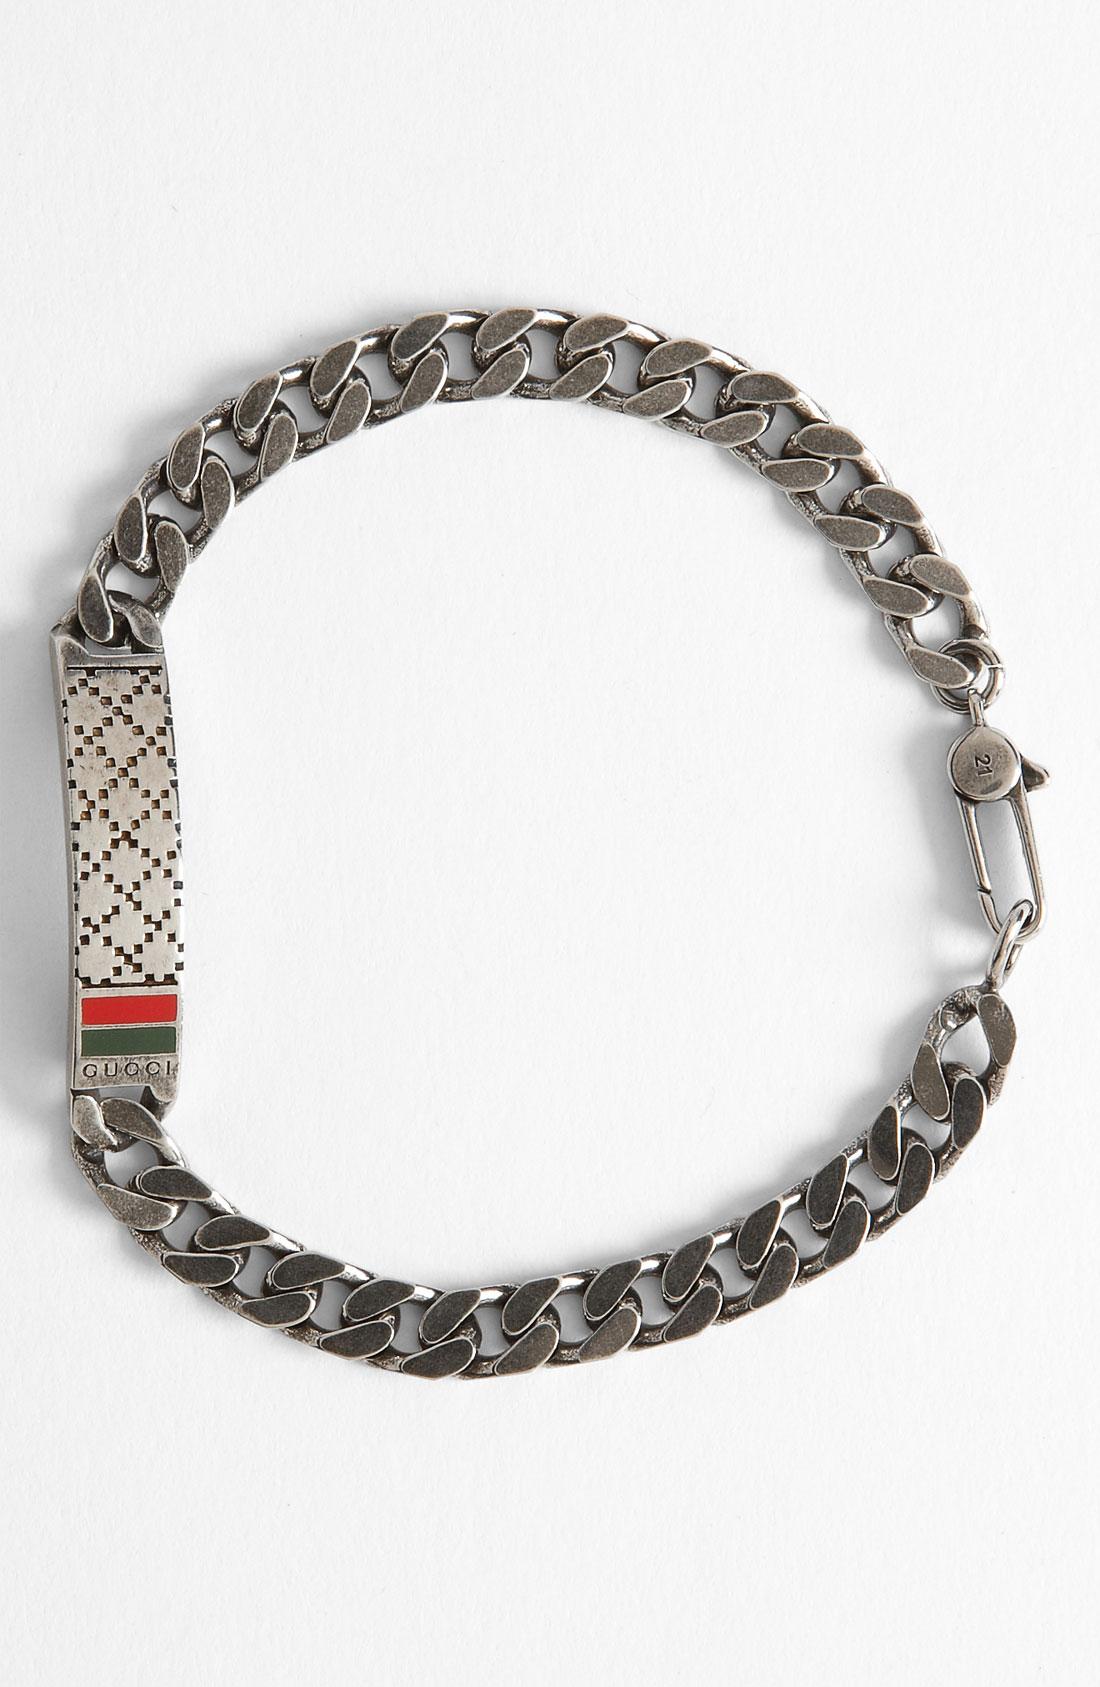 Gucci Mens Silver Bracelet Best 2018